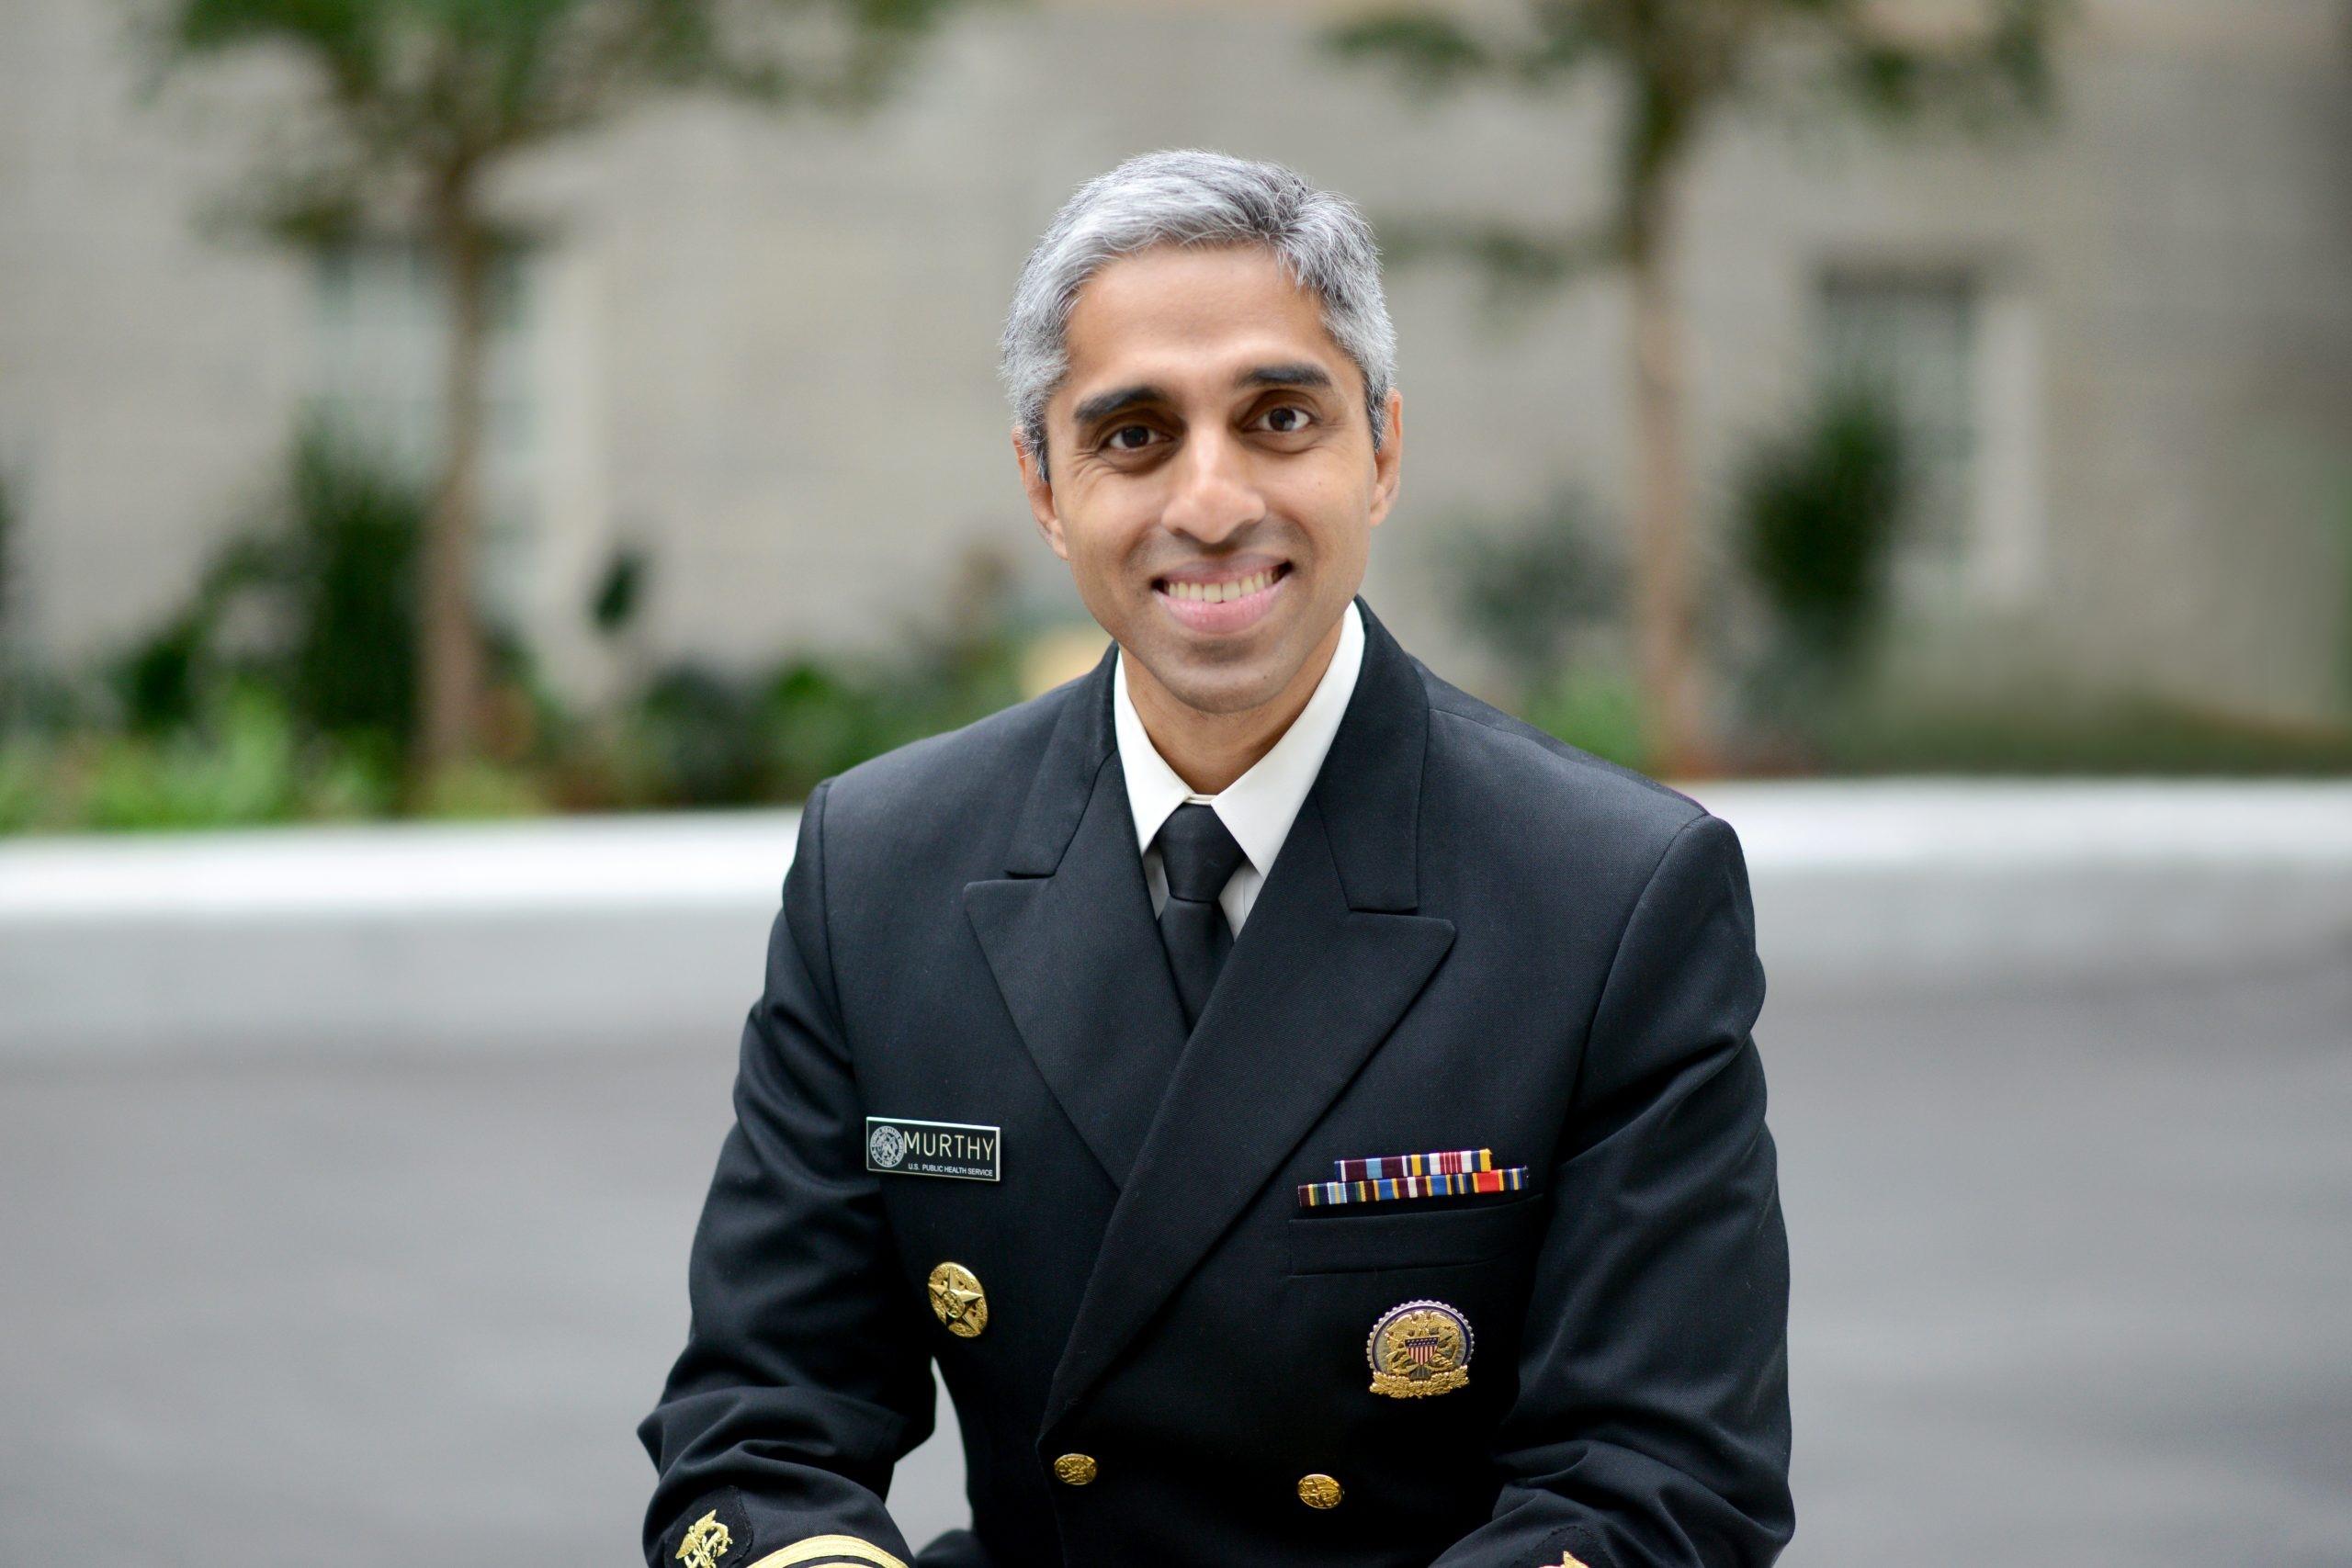 Dr. Vivek Murthy